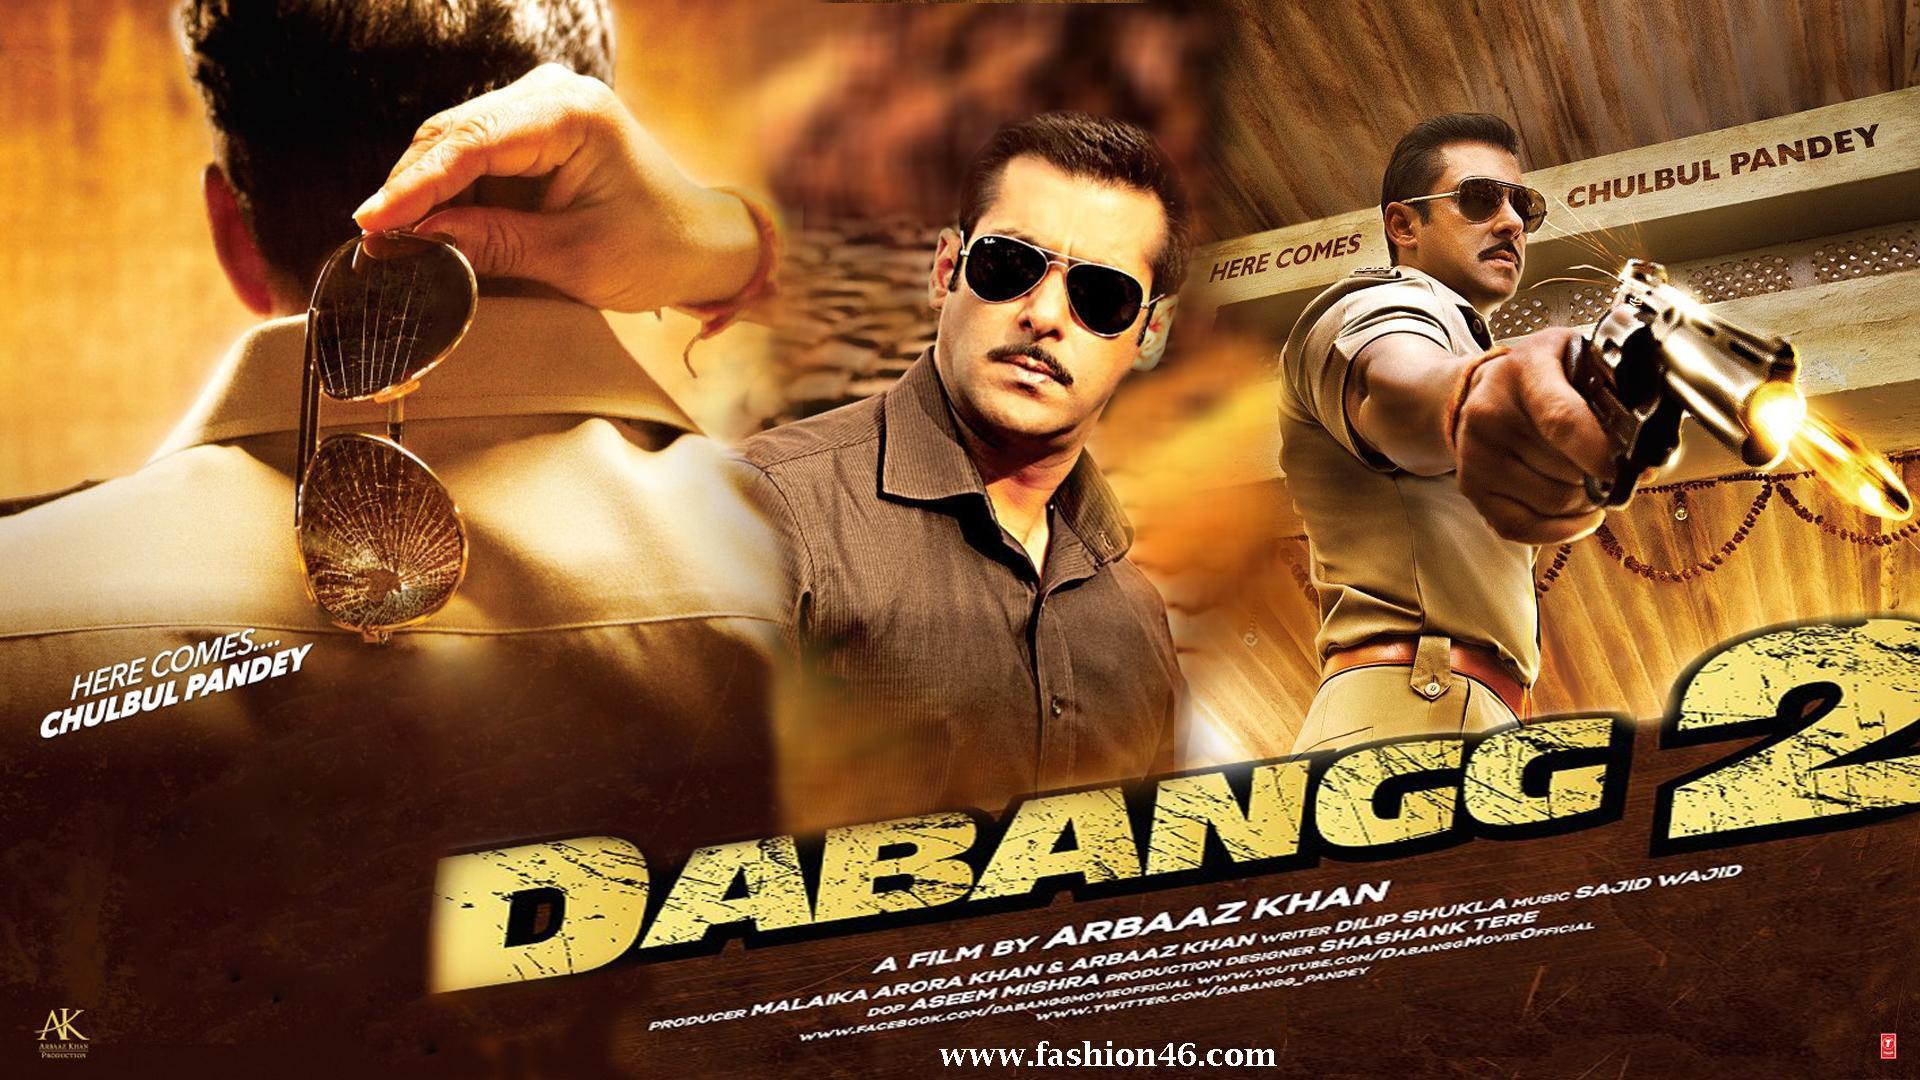 Dabangg 2 cross 100 crores Box Office